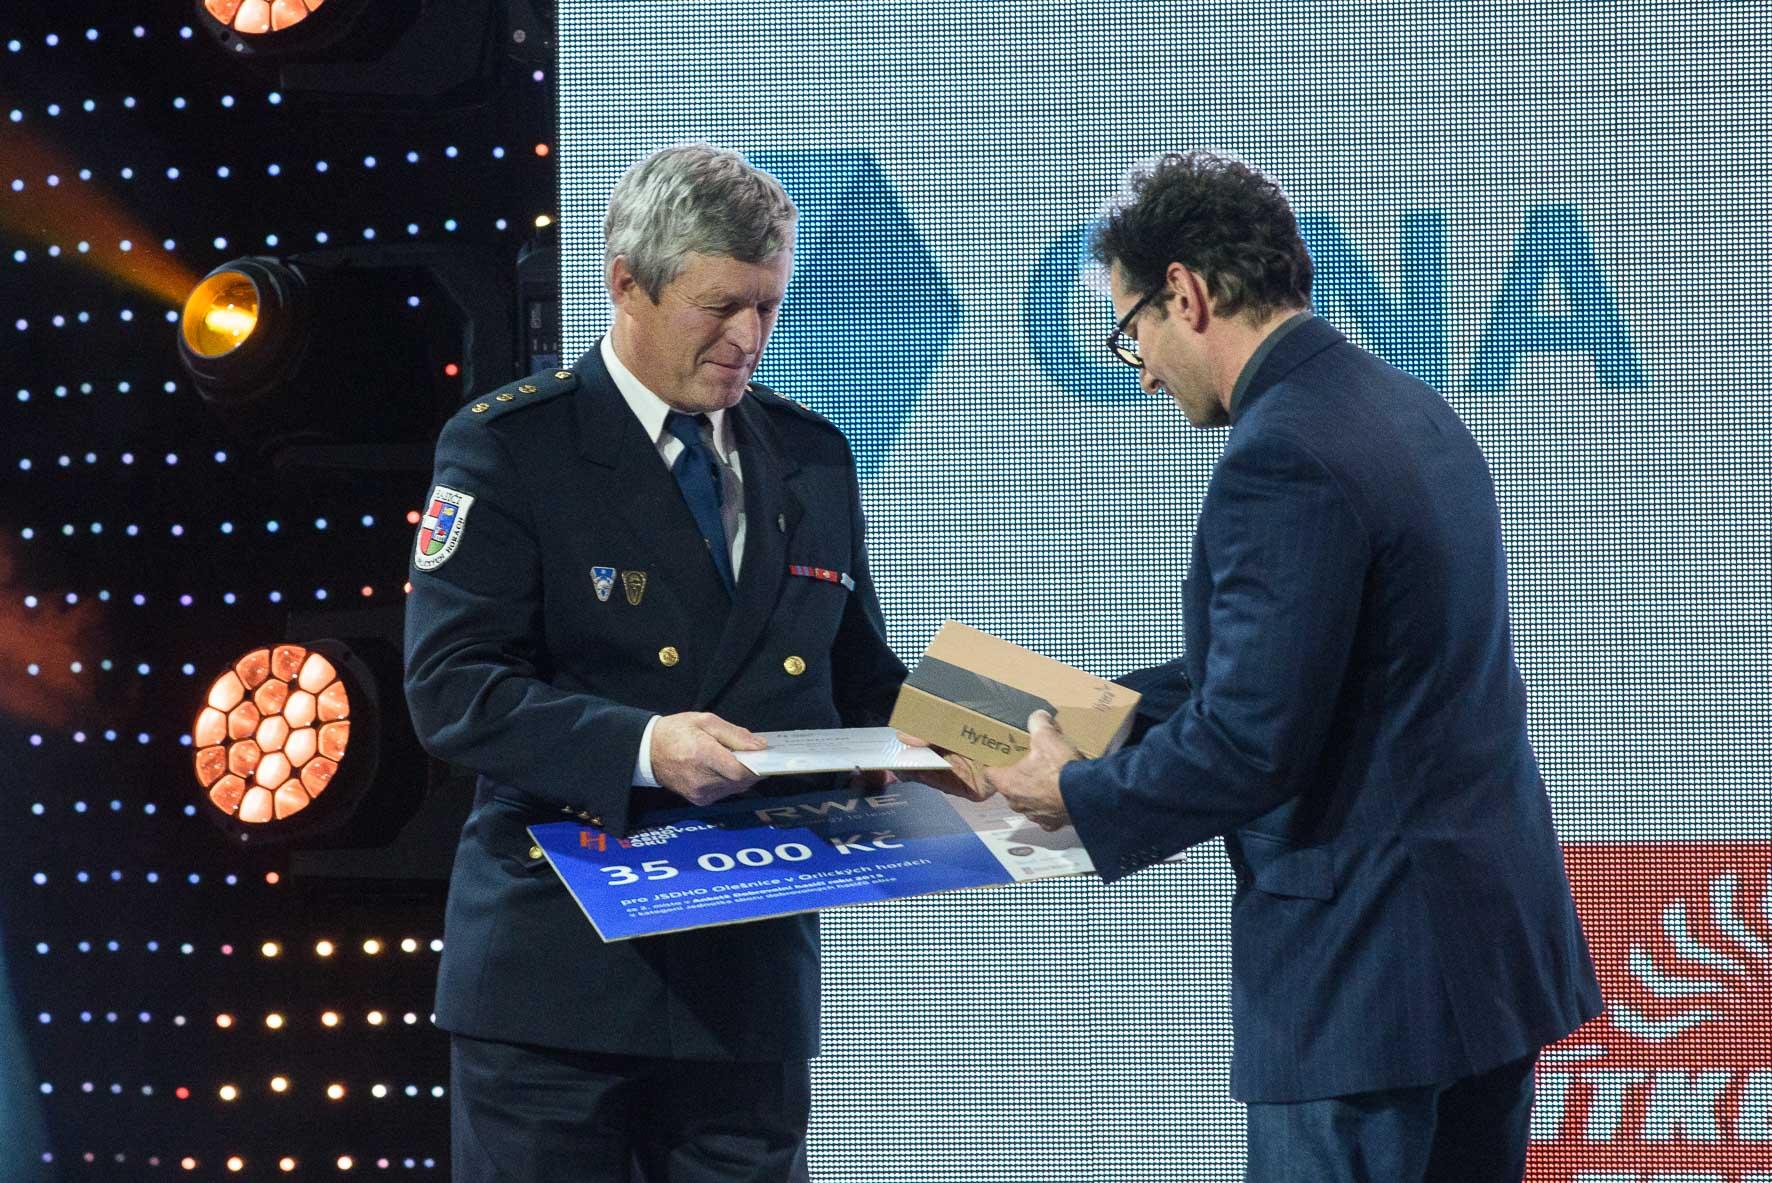 anketa-dobrovolni-hasici-roku-2015-vyhlaseni-vysledku-jsdh-olesnice-v-orlickych-horach